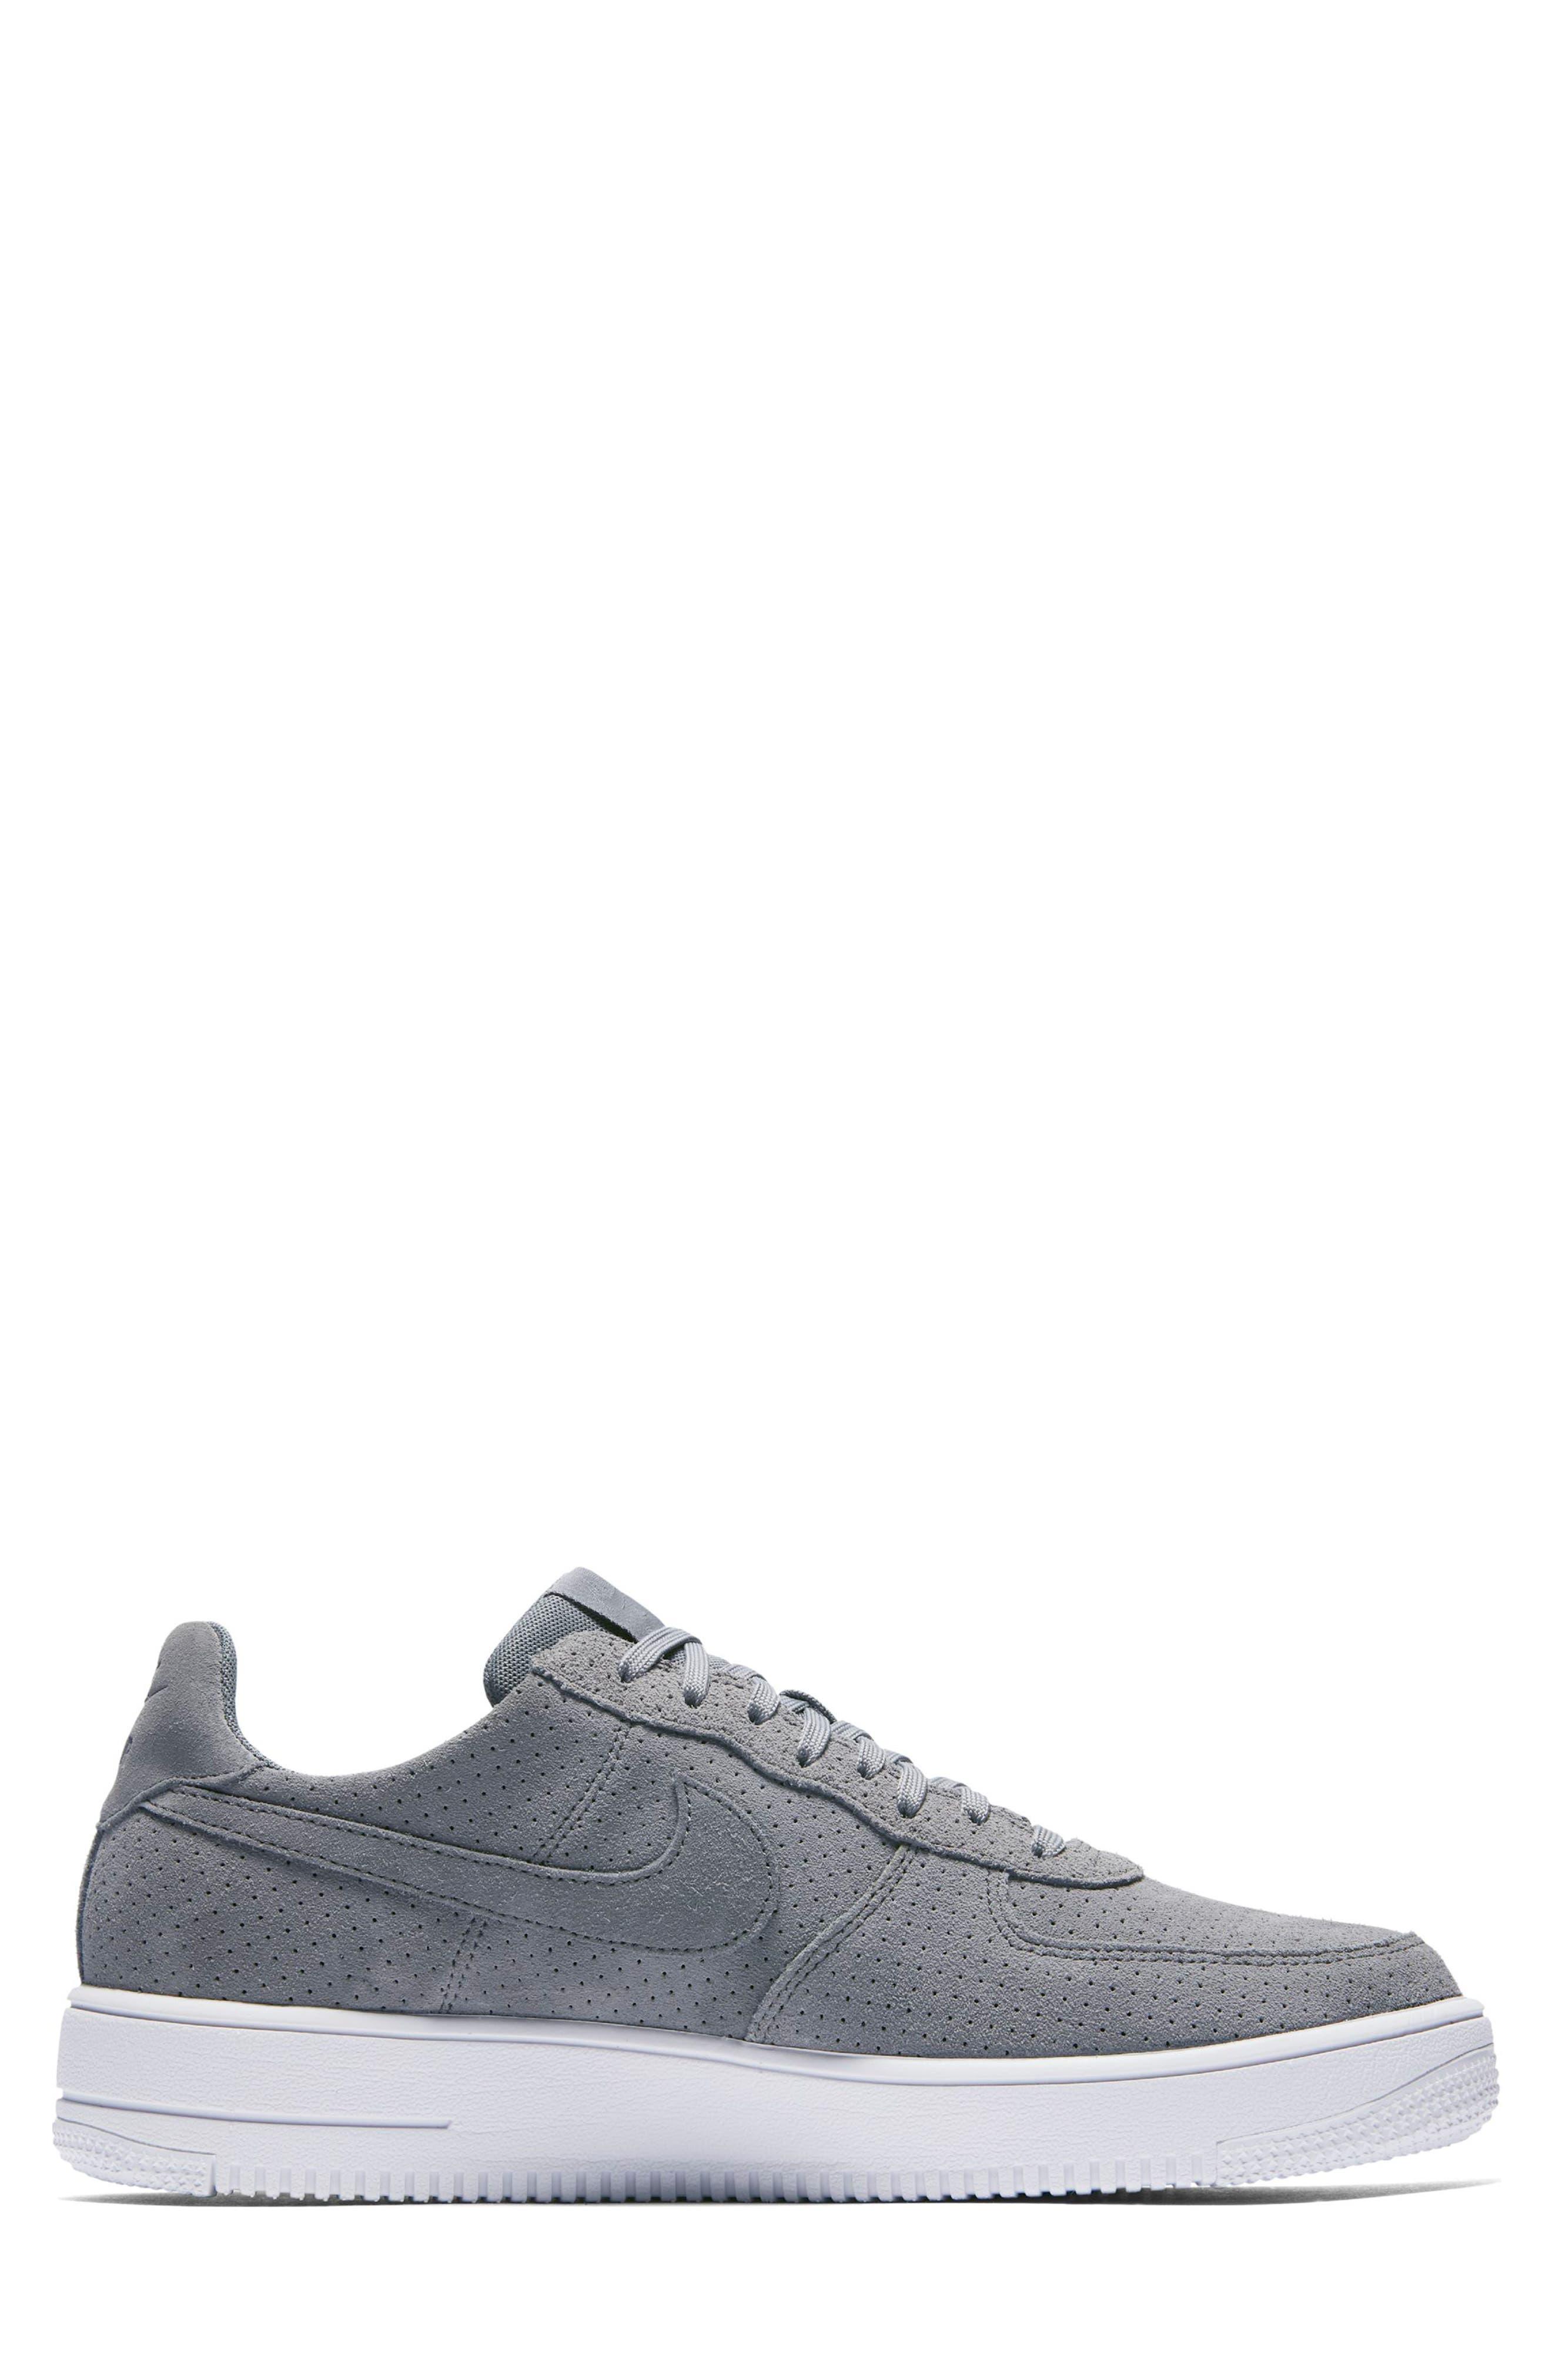 Air Force 1 Ultraforce Sneaker,                             Alternate thumbnail 2, color,                             029